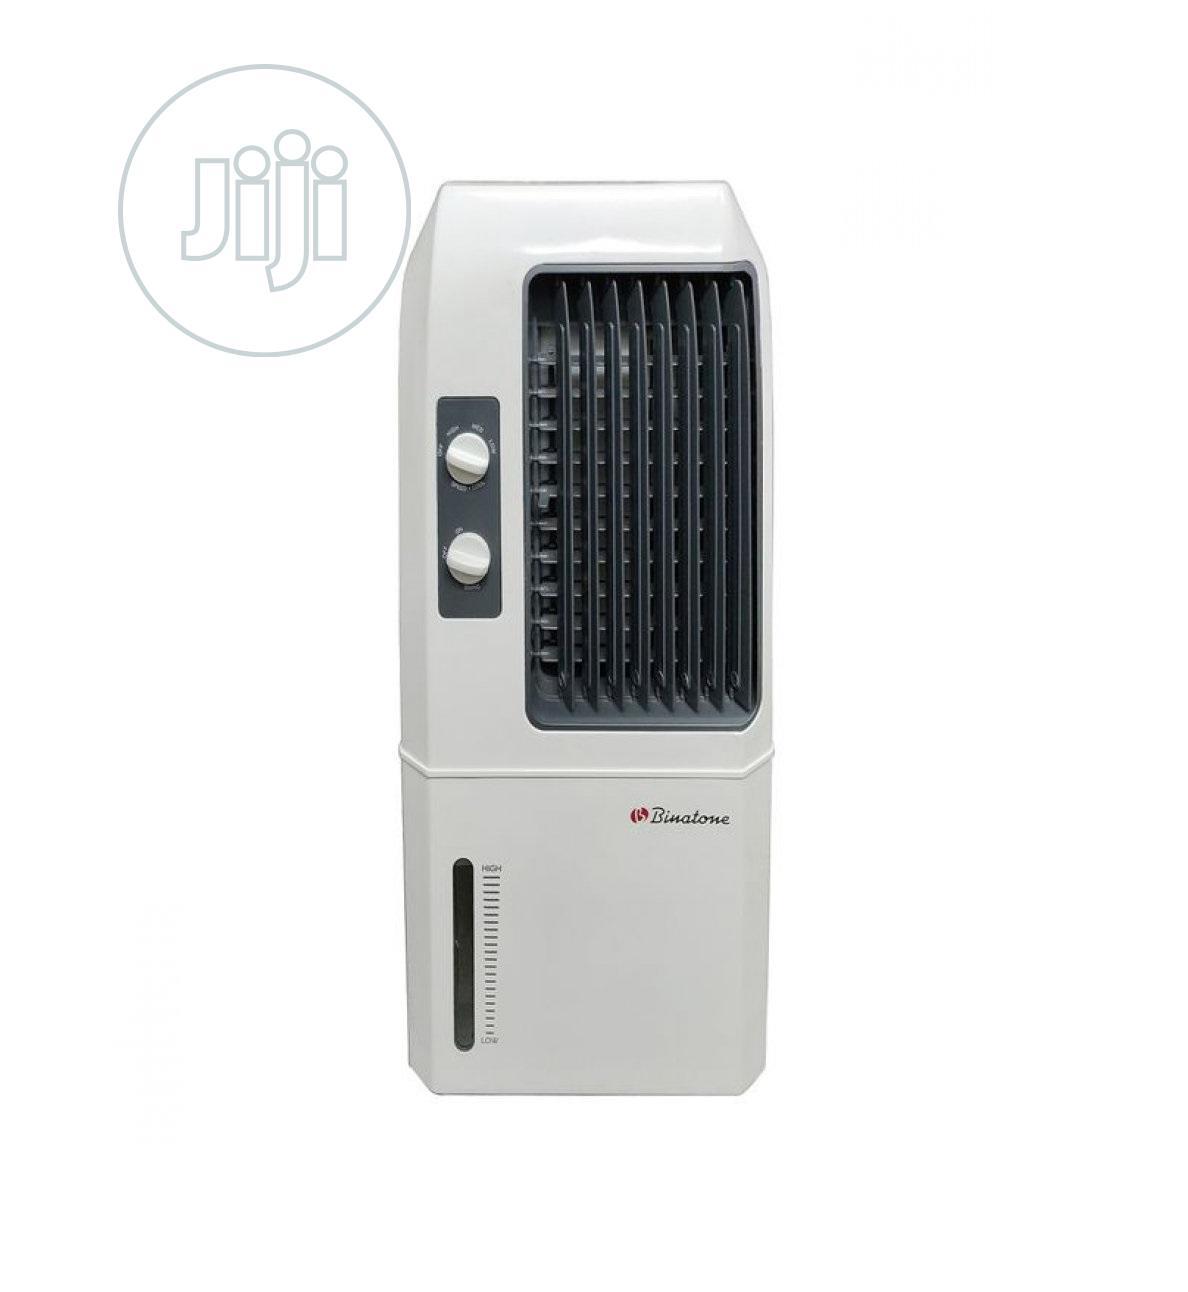 9L Portable Air Cooler BAC-090 - Binatone Mr19